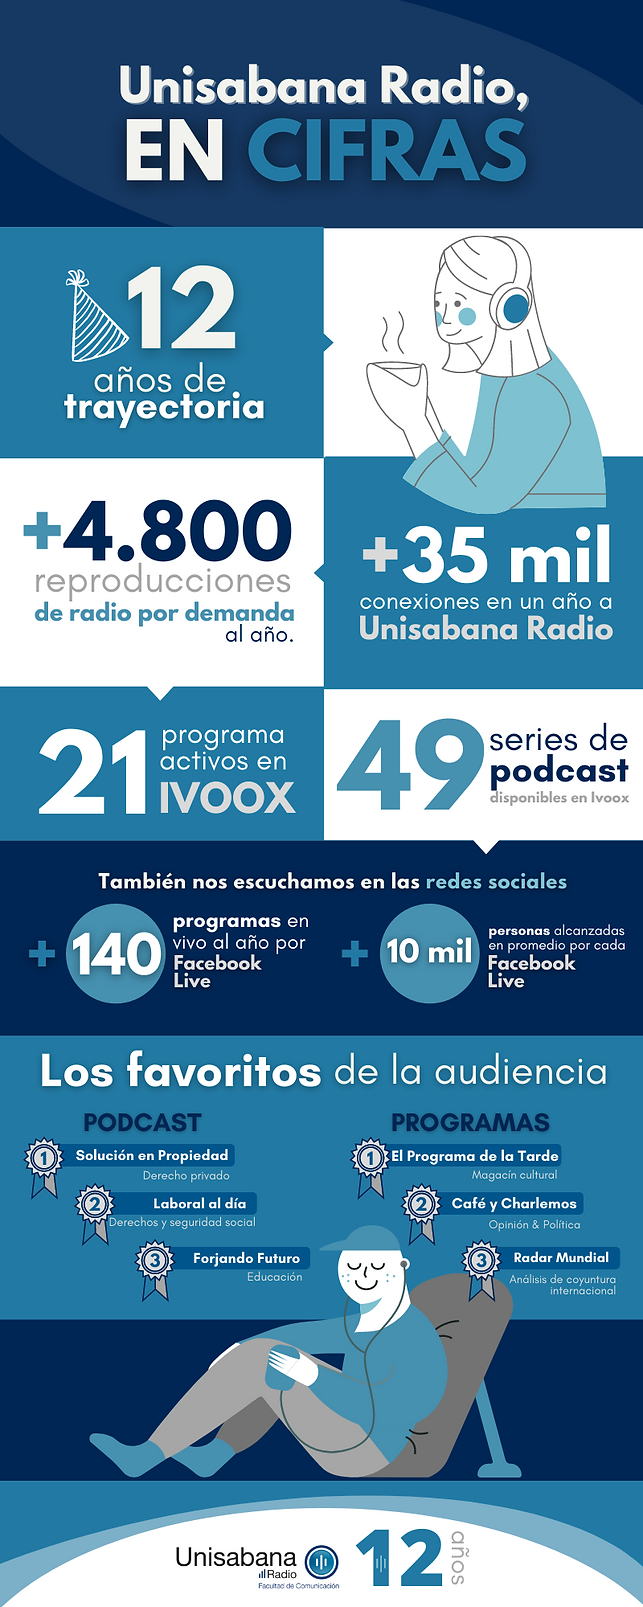 Unisabana Radio en cifras.png